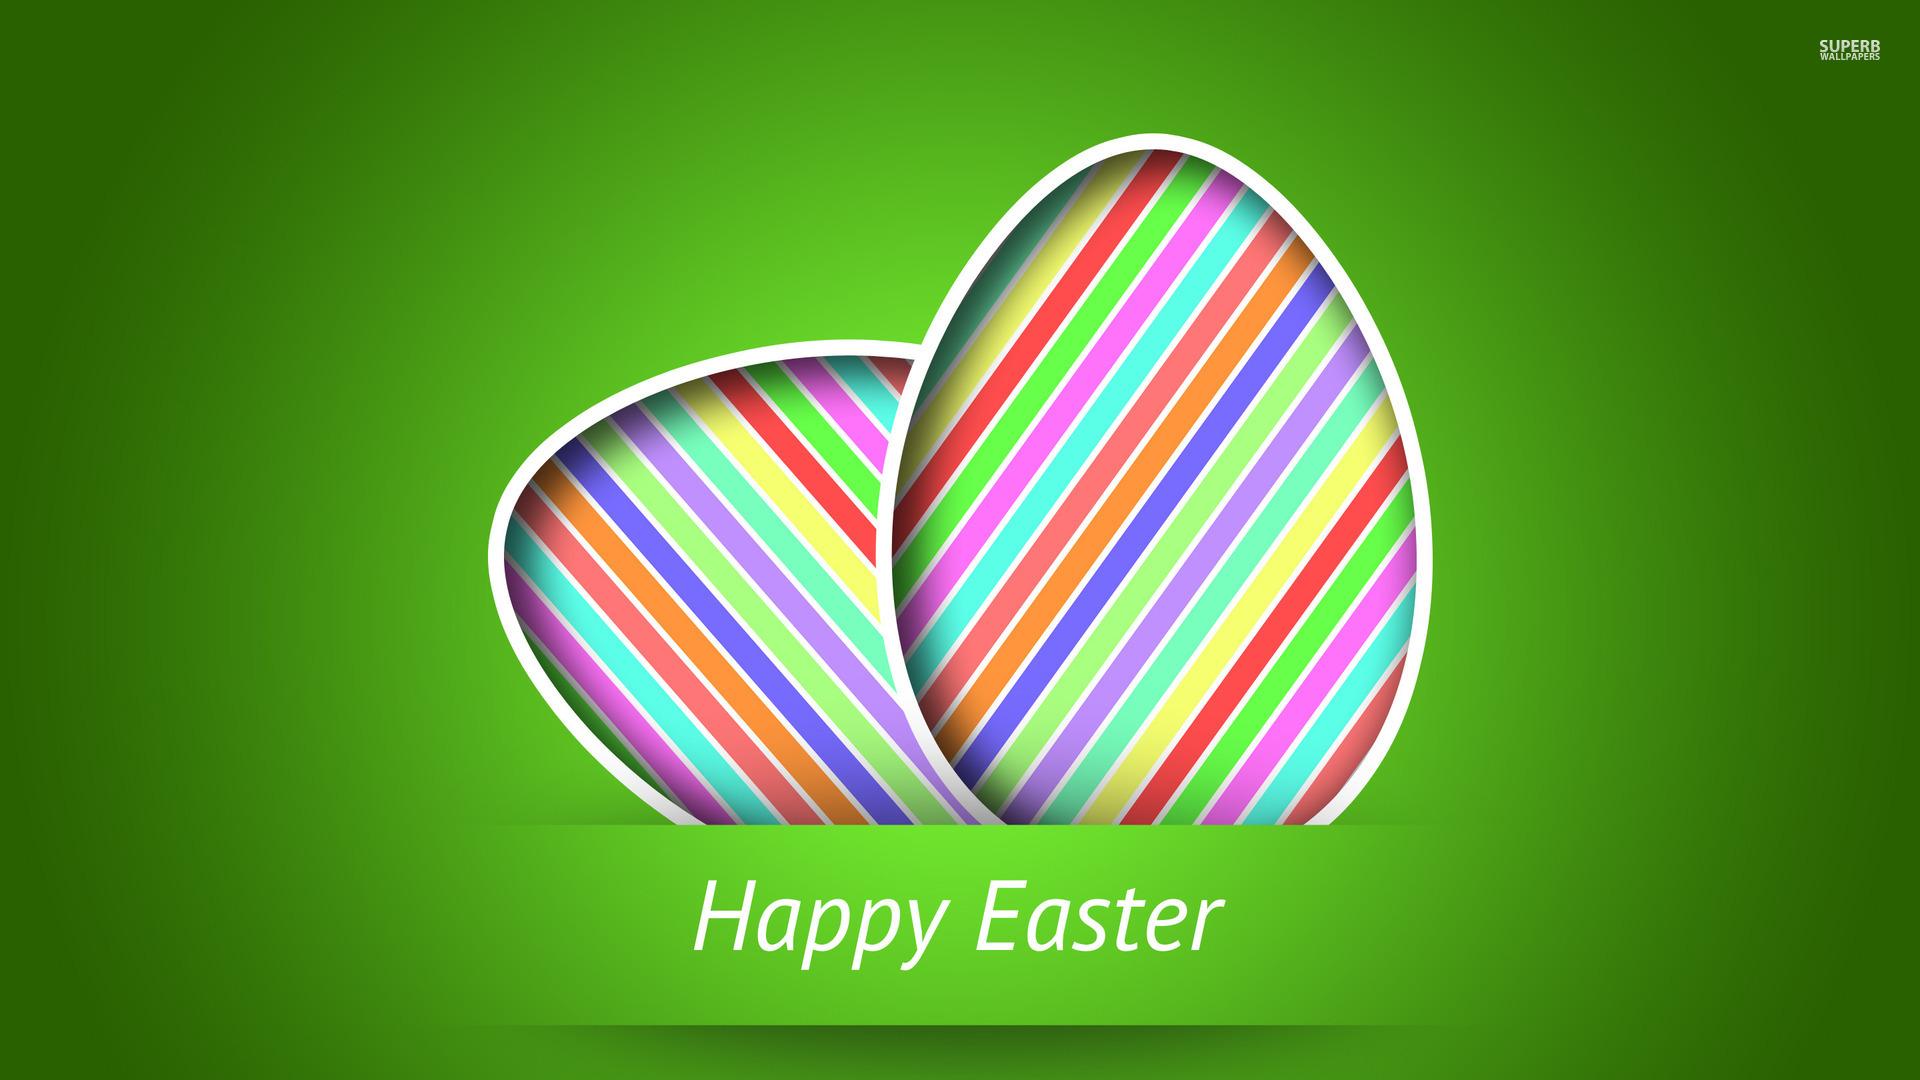 Happy Easter Desktop Wallpaper HD (34)